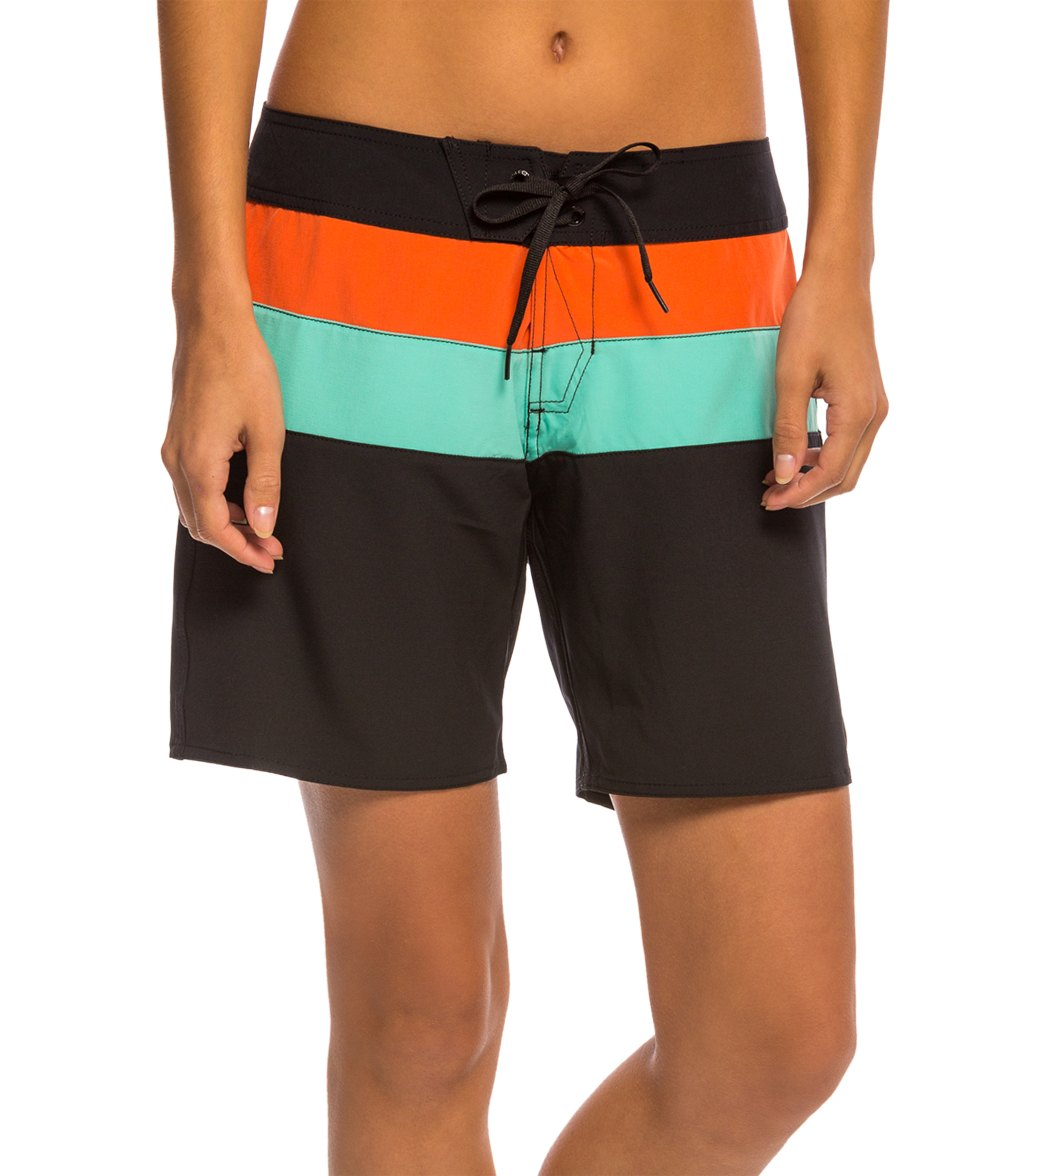 90caf5e63809 Volcom Women's Swimwear Simply Solid 7